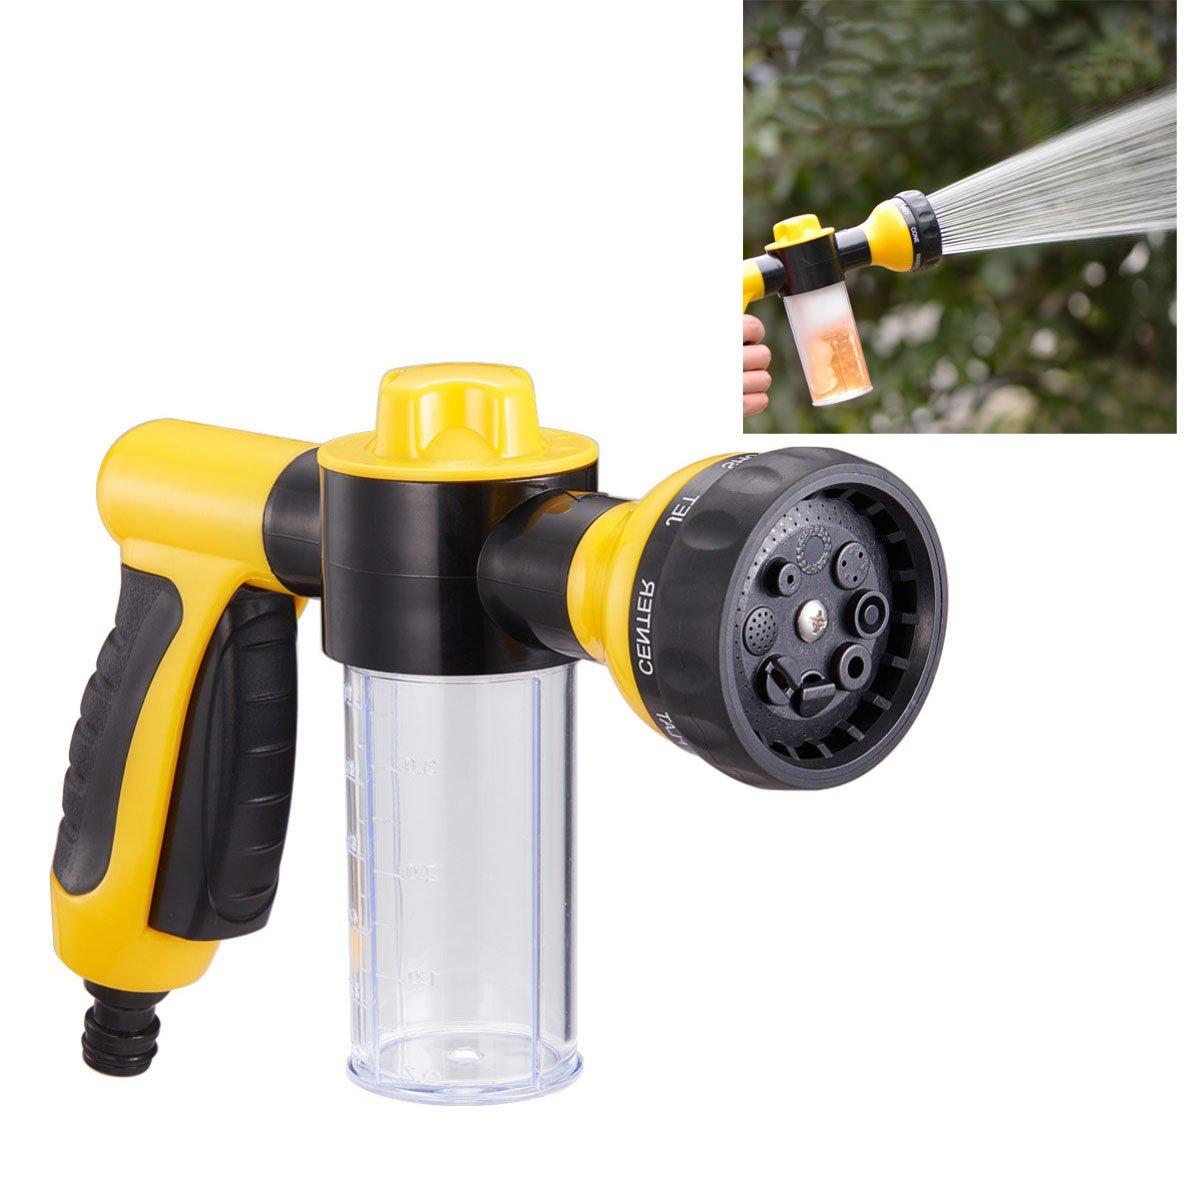 YeBon Multifunction Auto Car Foam Water Gun Car Washer Water Gun portable high Pressure Car Wash Water Gun Home Car Foam…